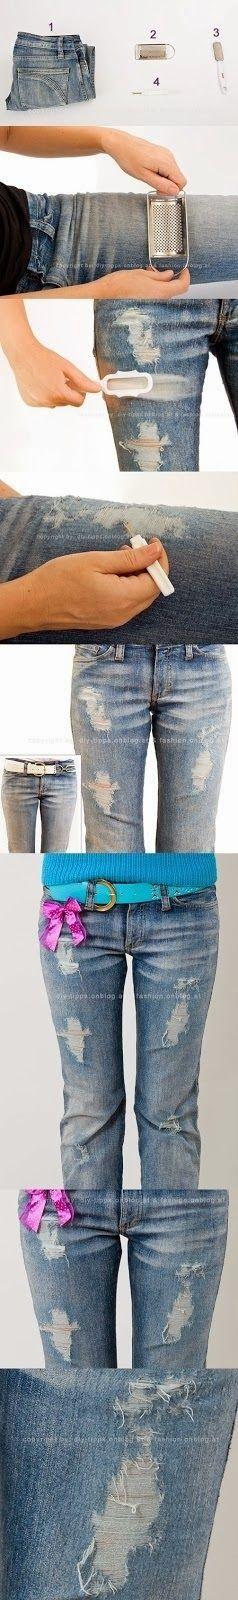 Facil idea para customizar tu ropa. #reciclar #DIY